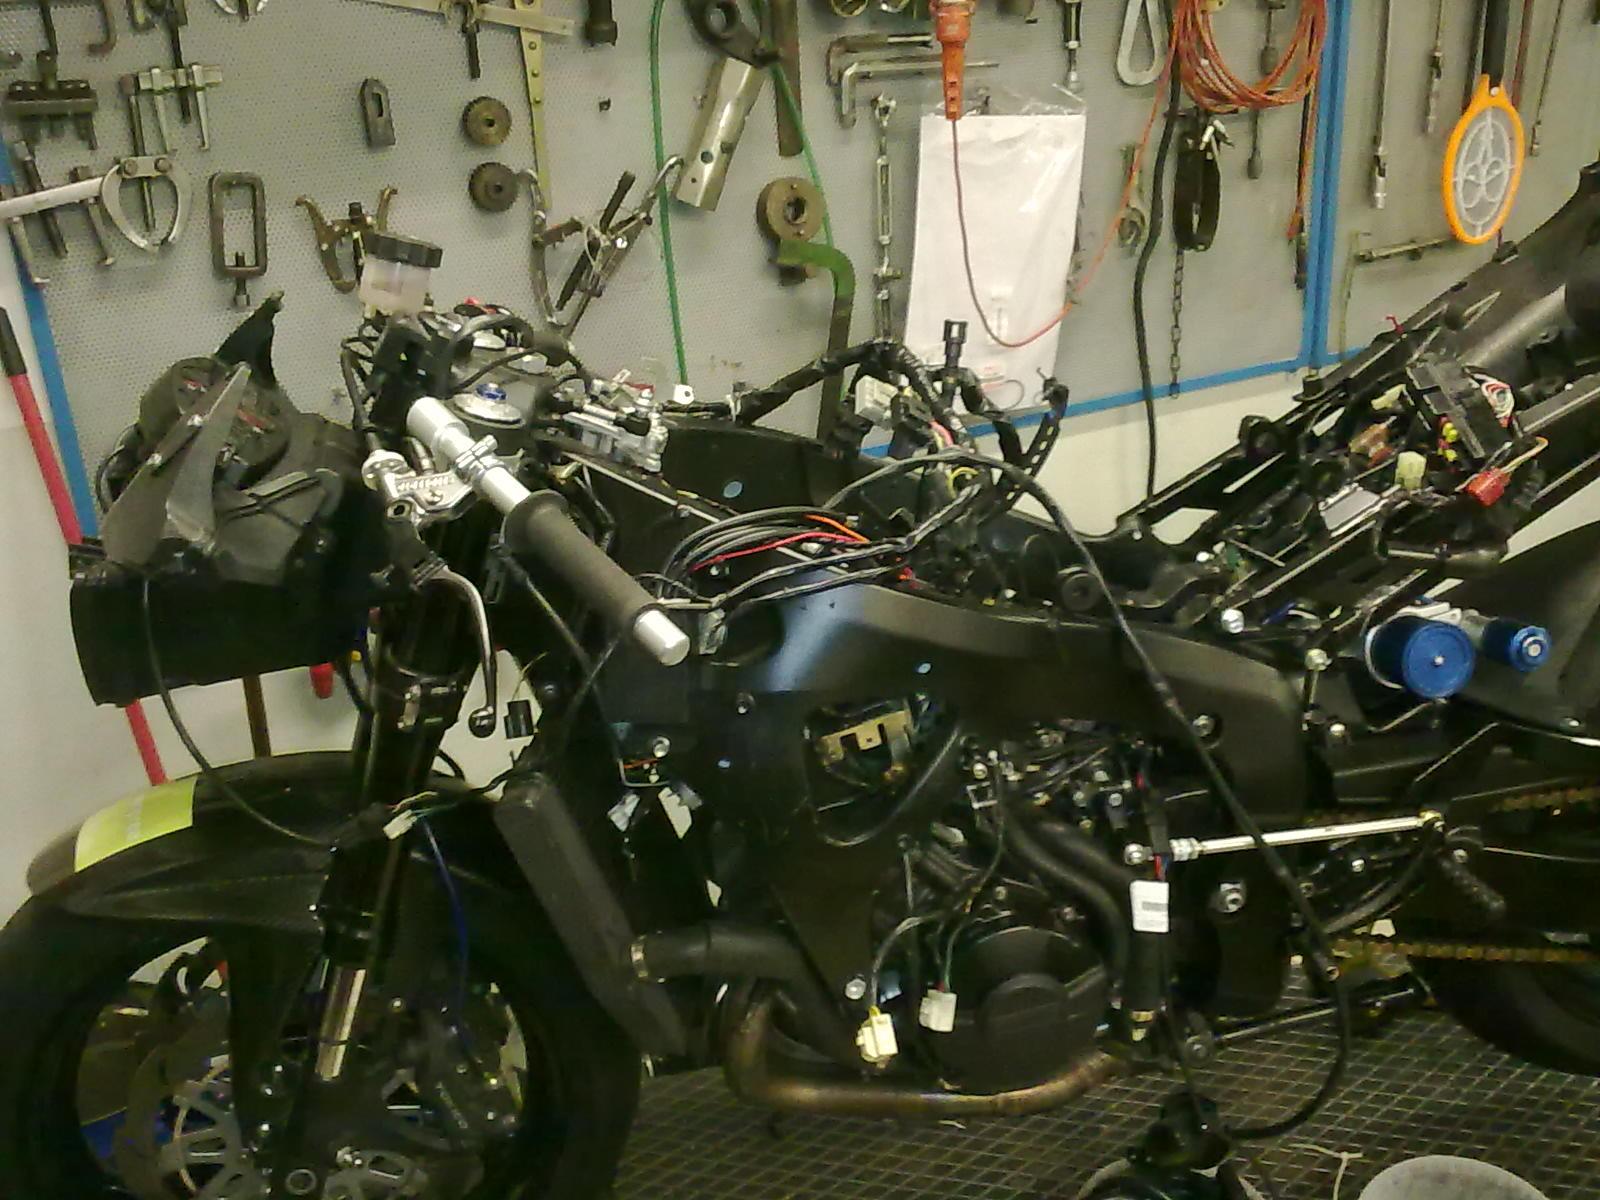 Schema Elettrico Honda Hornet 600 : Motofficina bencini backstage cbr rr